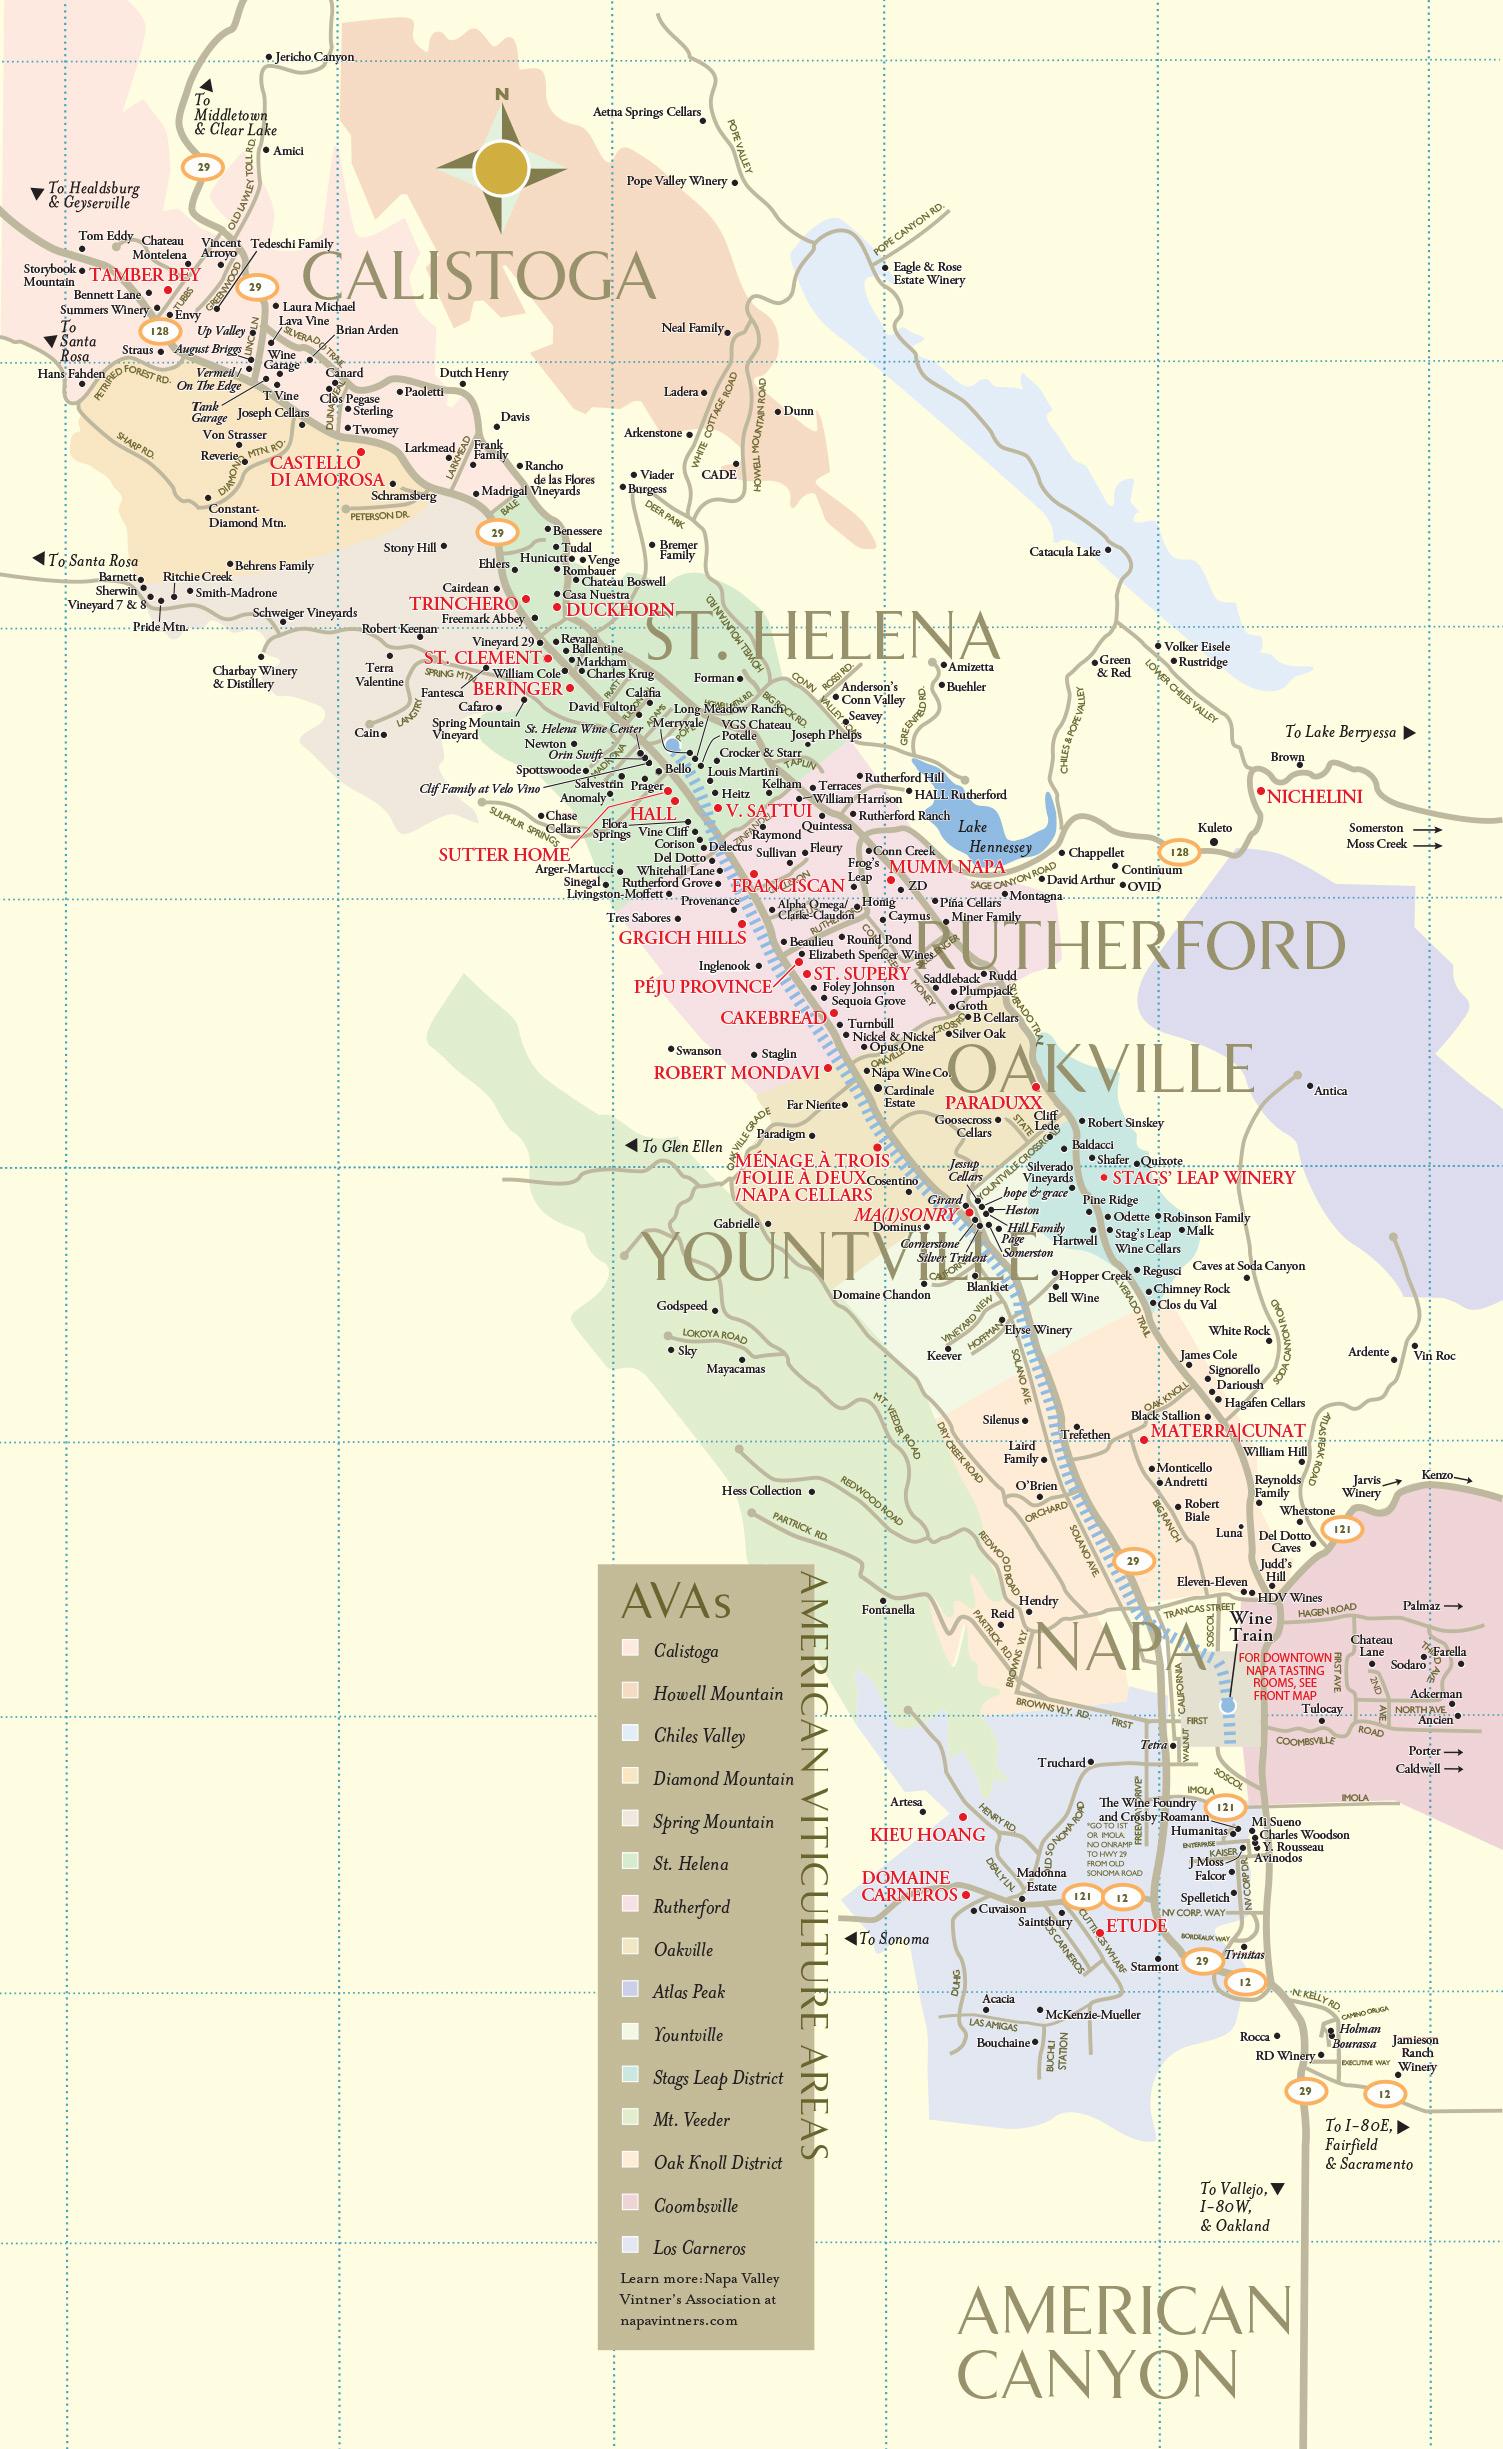 Napa Valley Wineries | Wine Tastings, Tours & Winery Map - California Vineyards Map